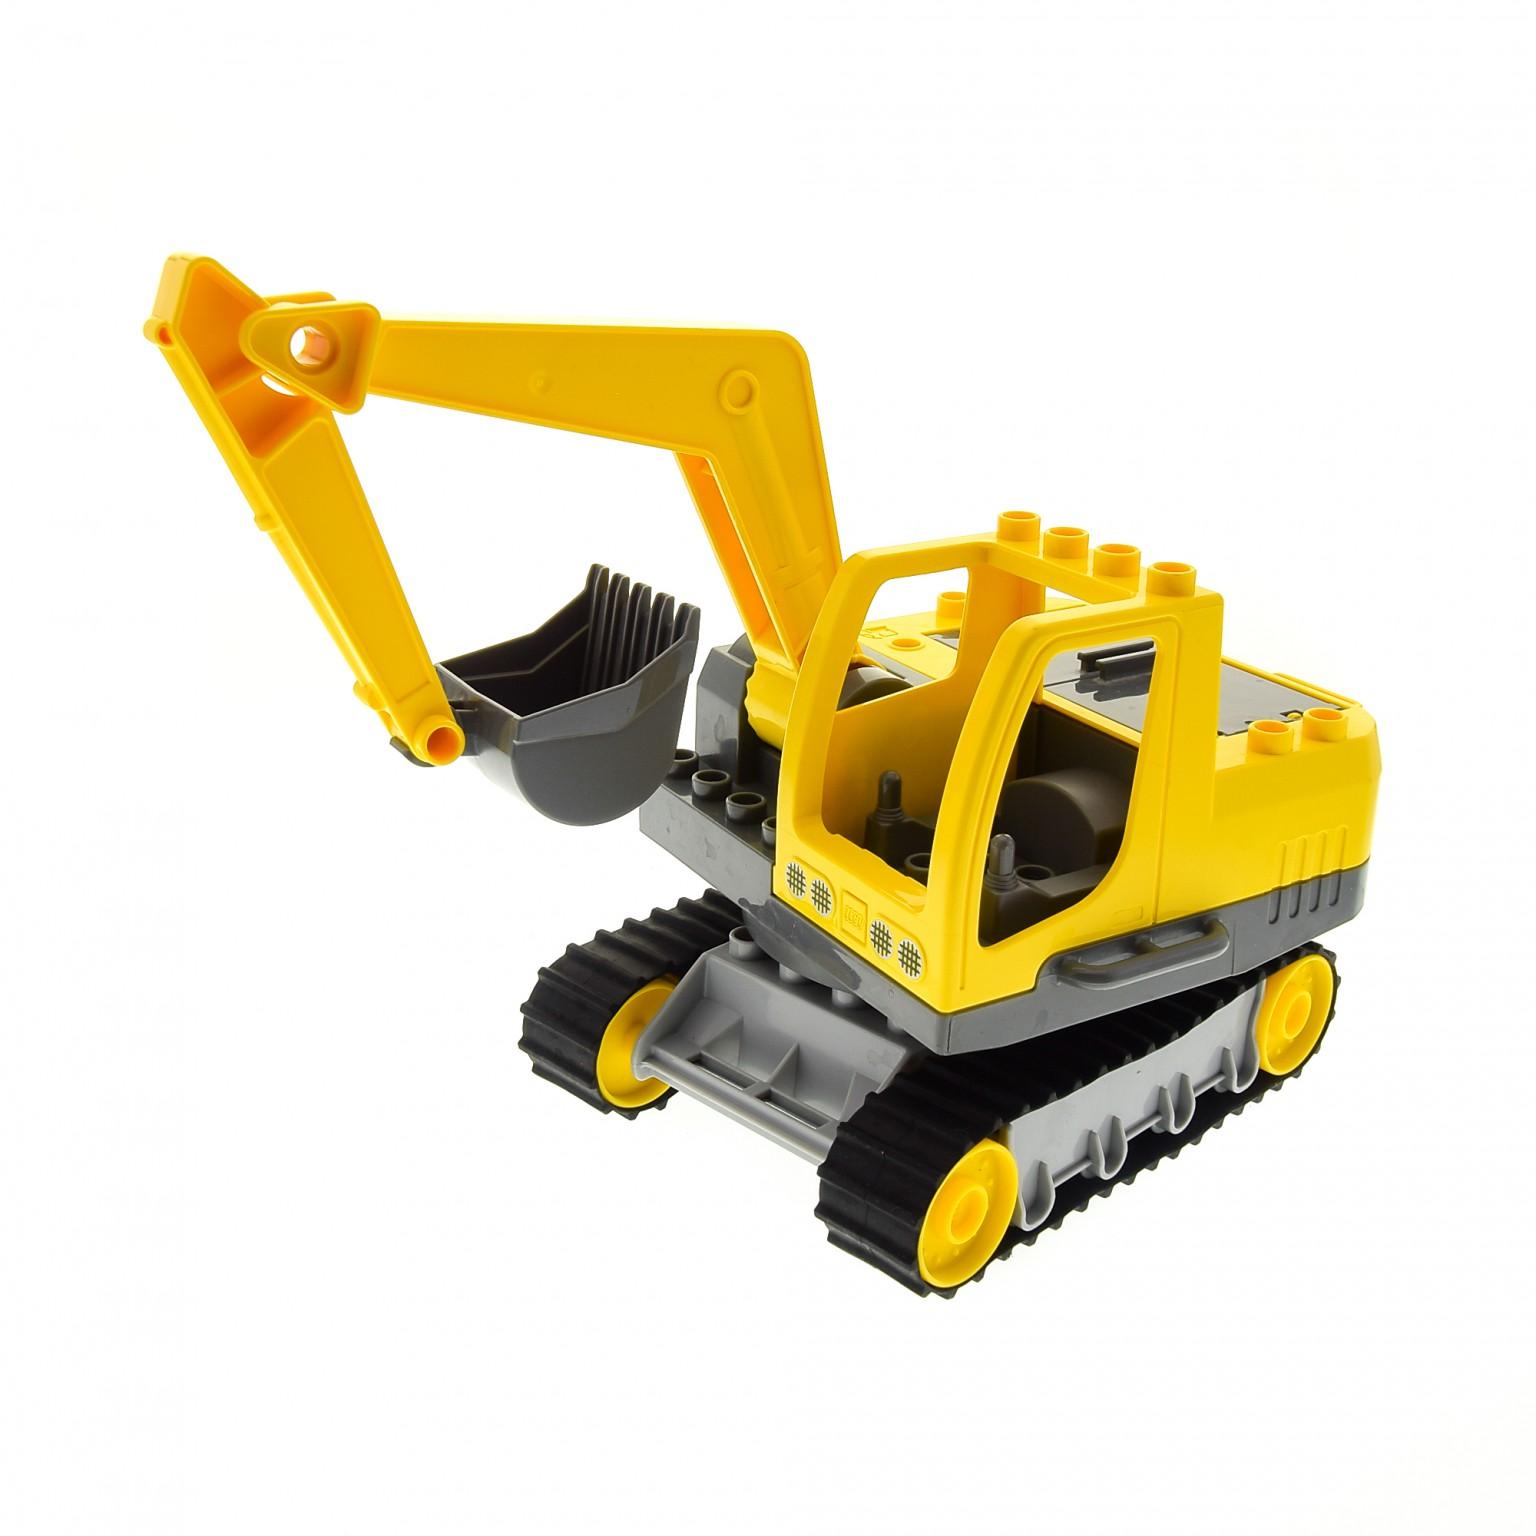 Lego ® Duplo Ville Set 4986  Raupenbagger Baustelle Bagger  vollständig